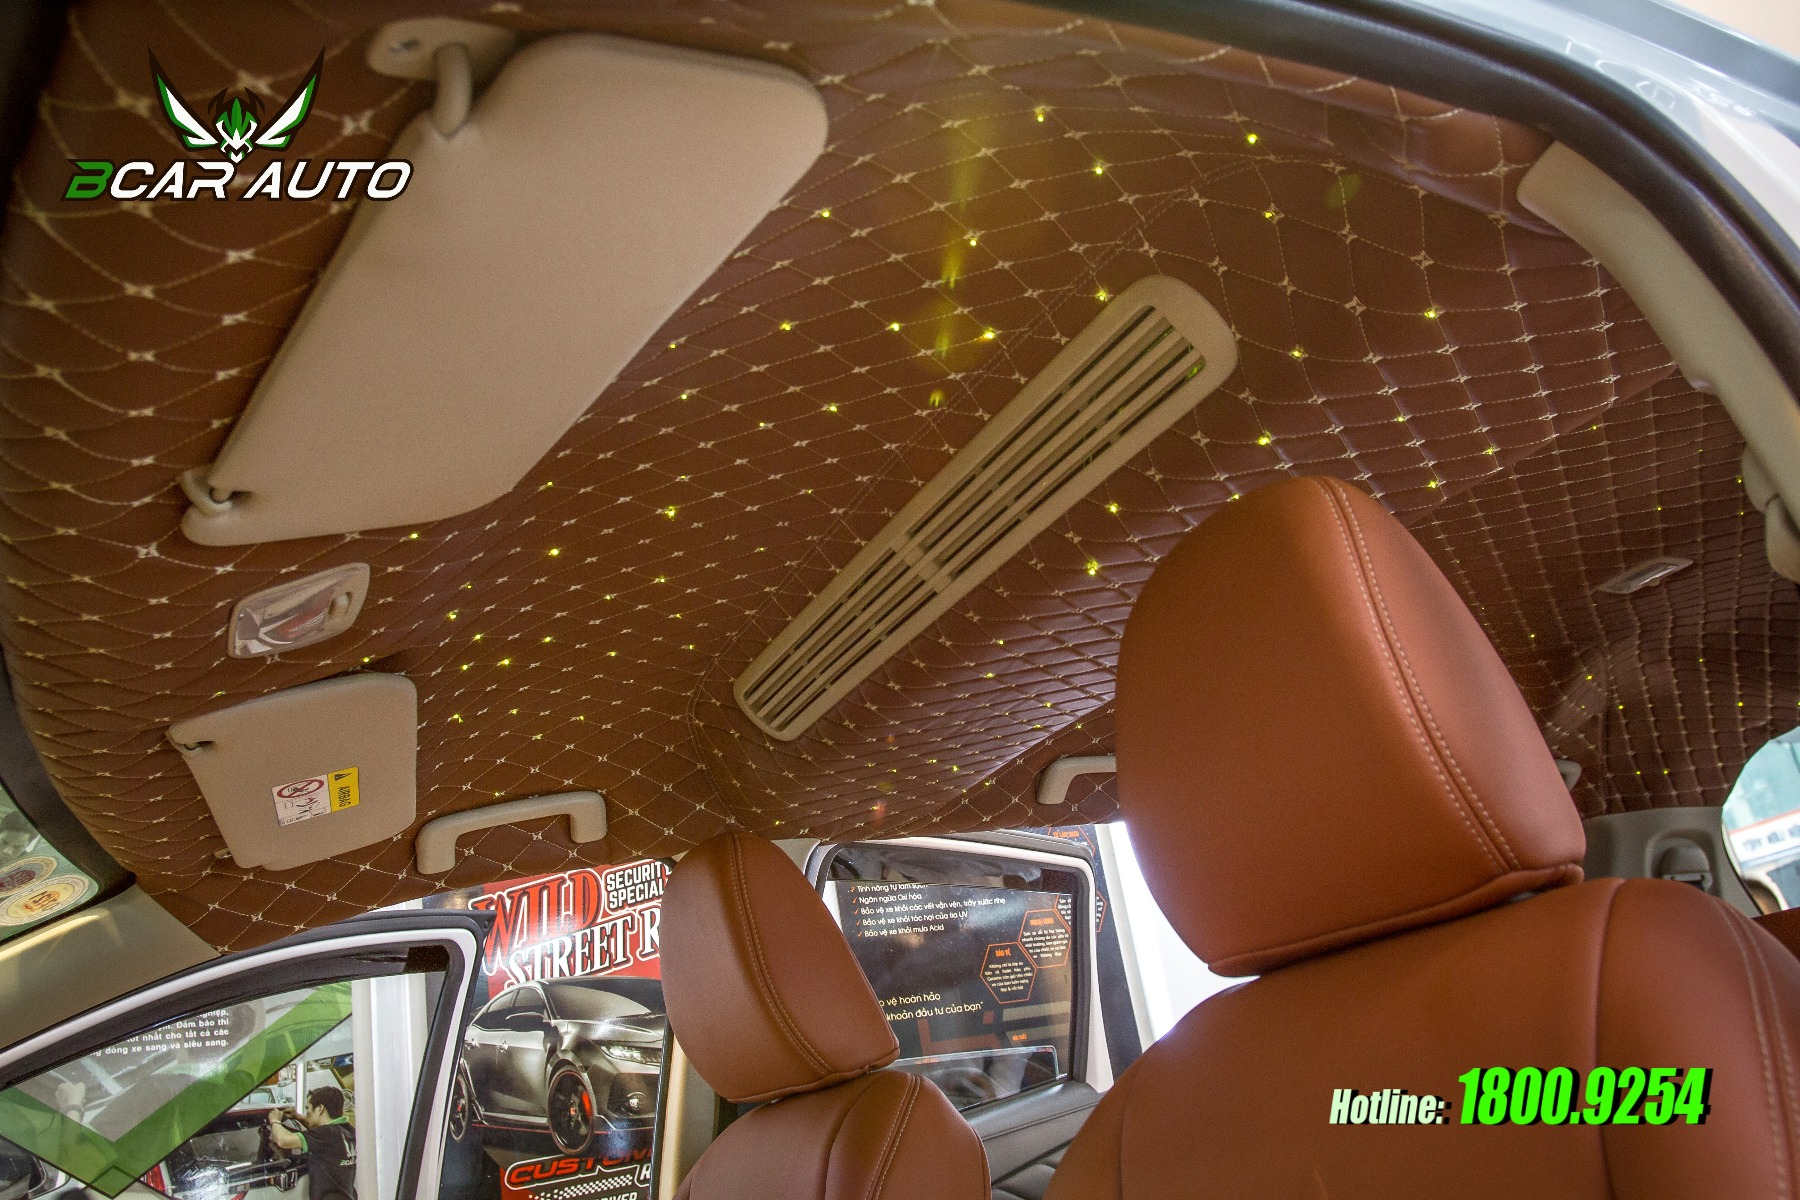 Trần ánh sao xe ô tô